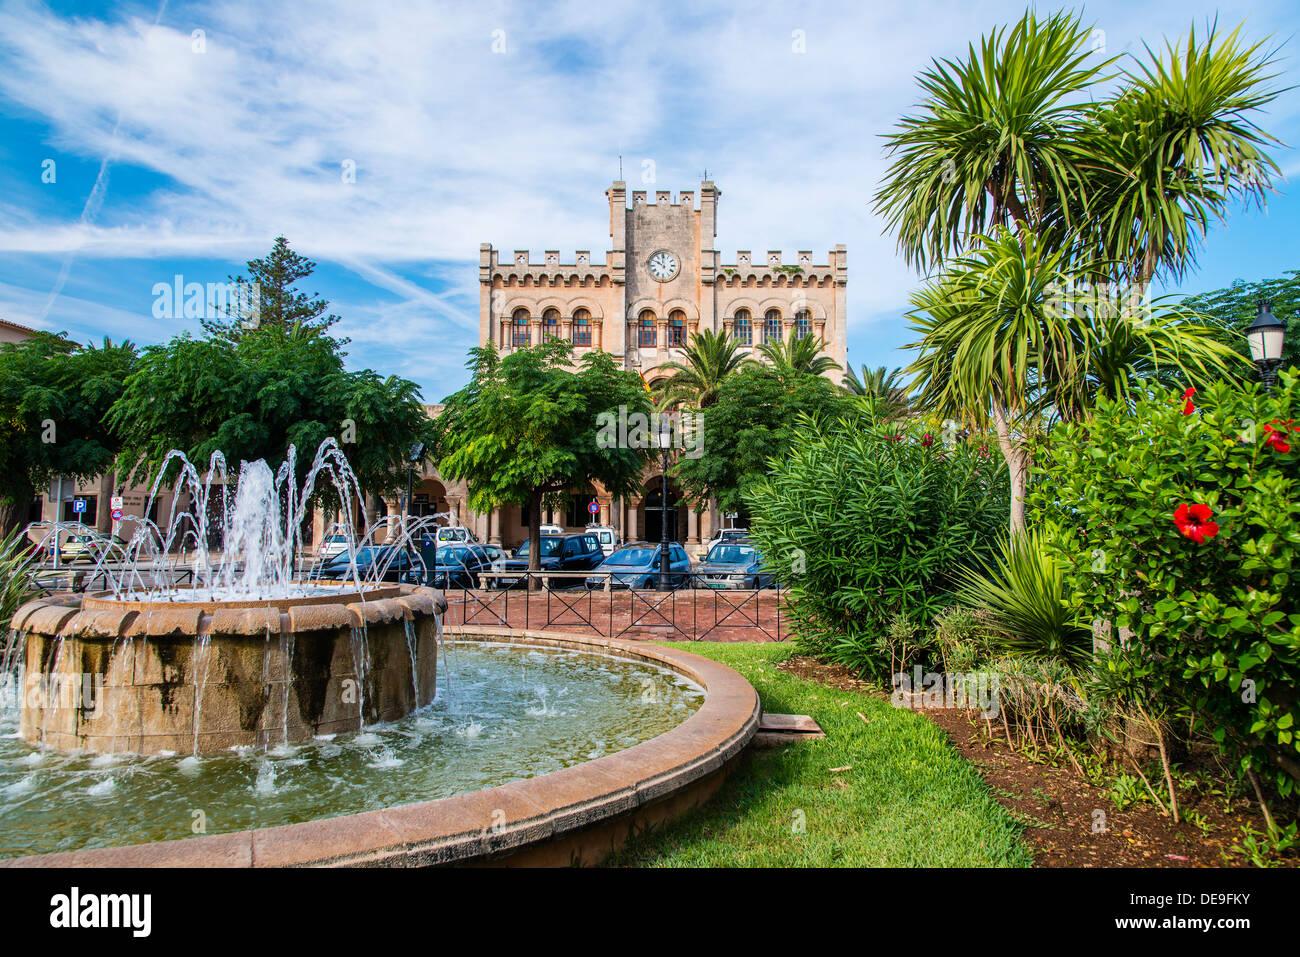 Plaça d'es Born square, Ciutadella, Minorca or Menorca, Balearic Islands, Spain - Stock Image